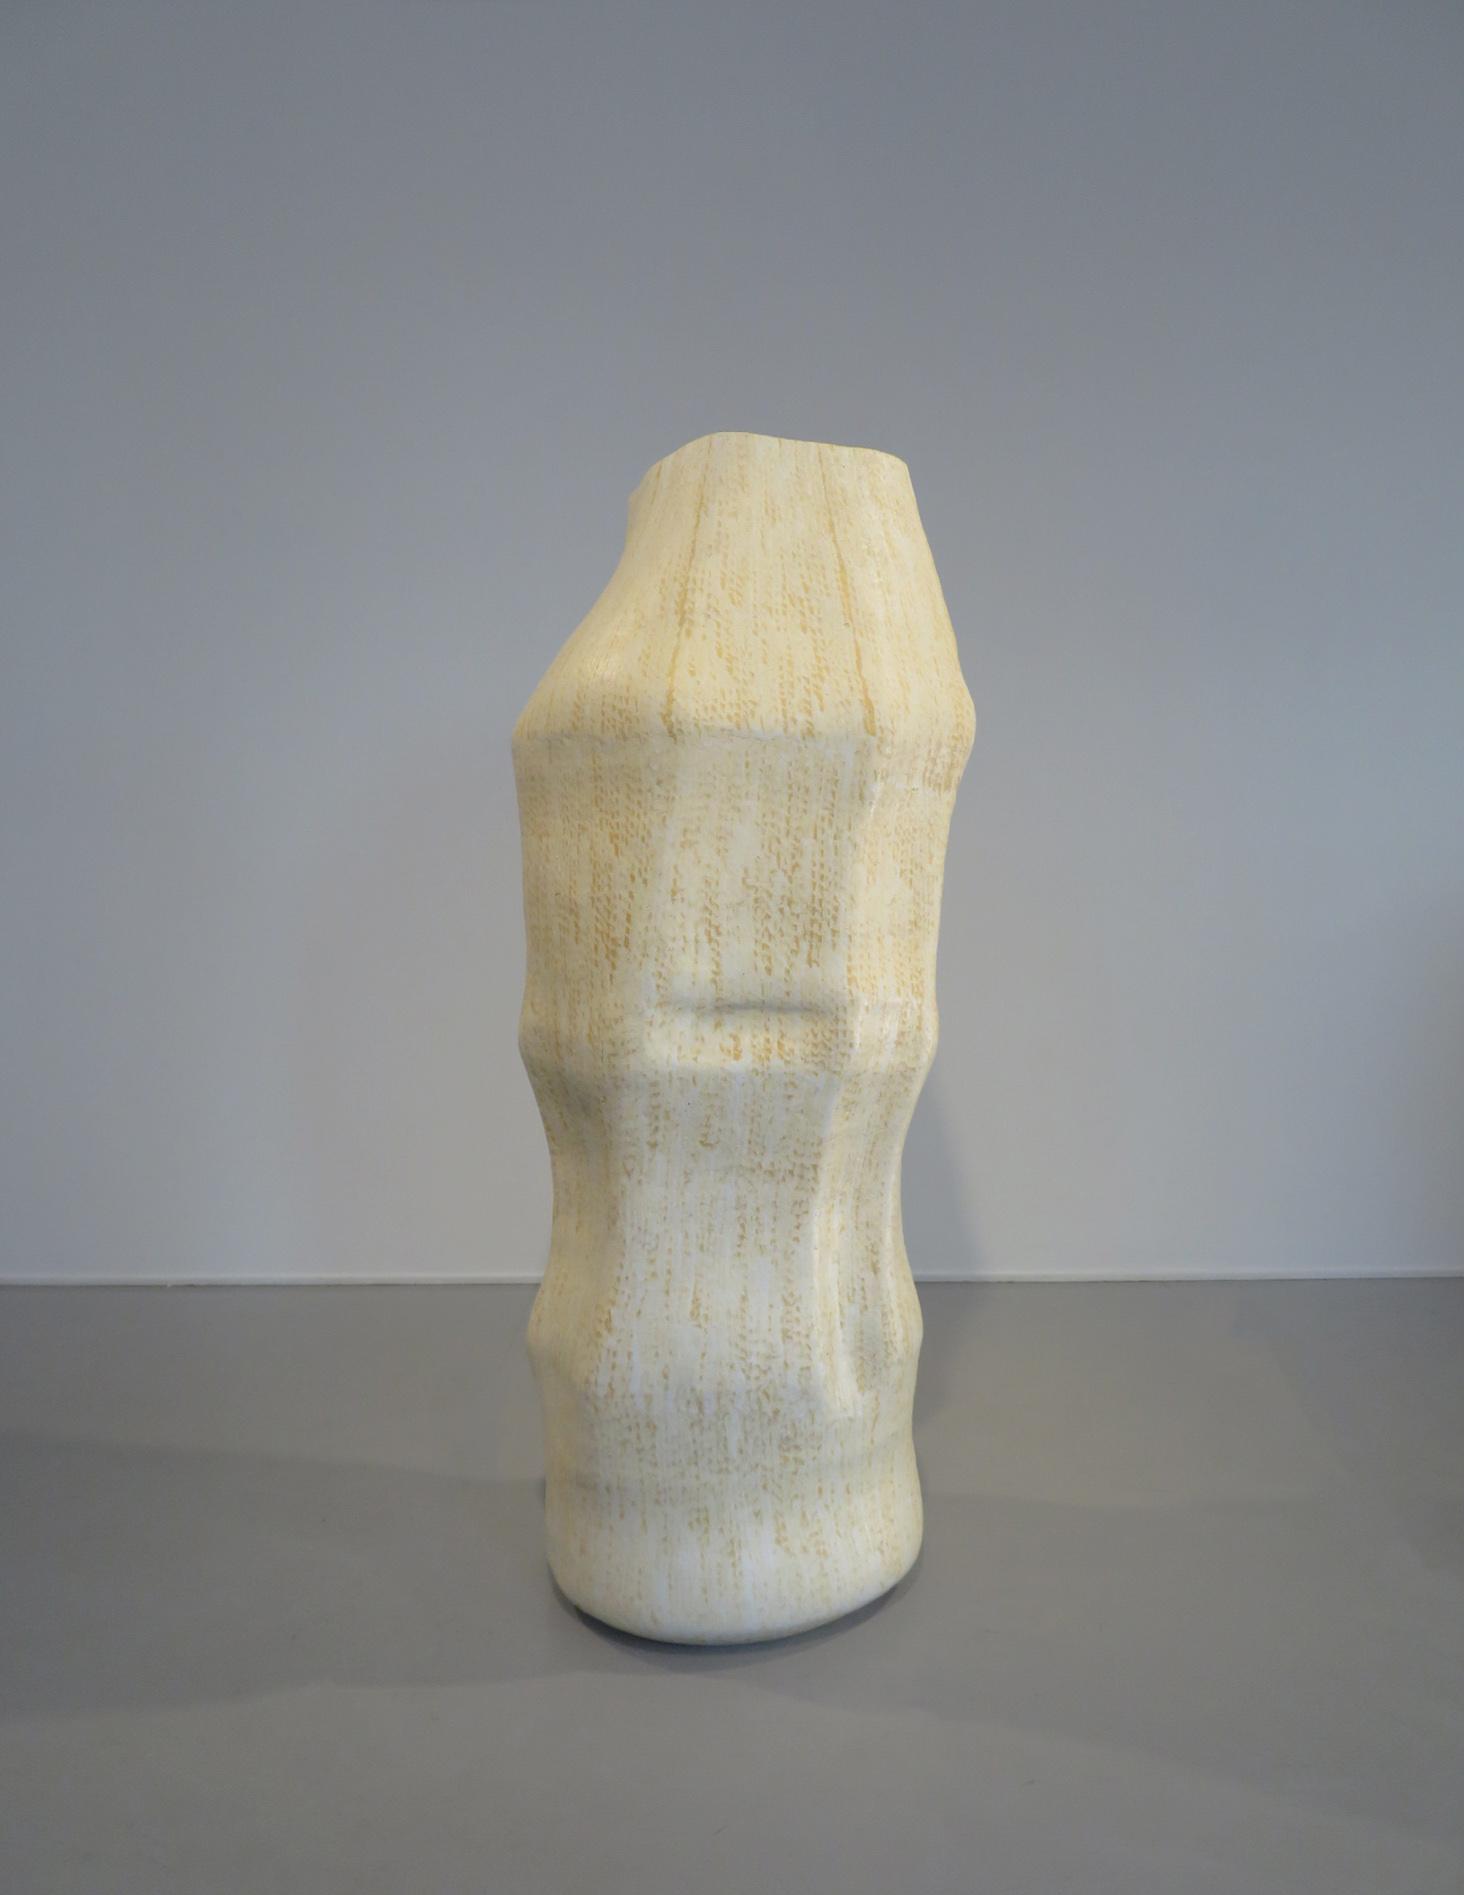 Qaa II , 2018 | Handbuilt/coiled stoneware, Hans Coper glaze with titanium oxide  Photo credit: Courtesy of Galleri Format Oslo